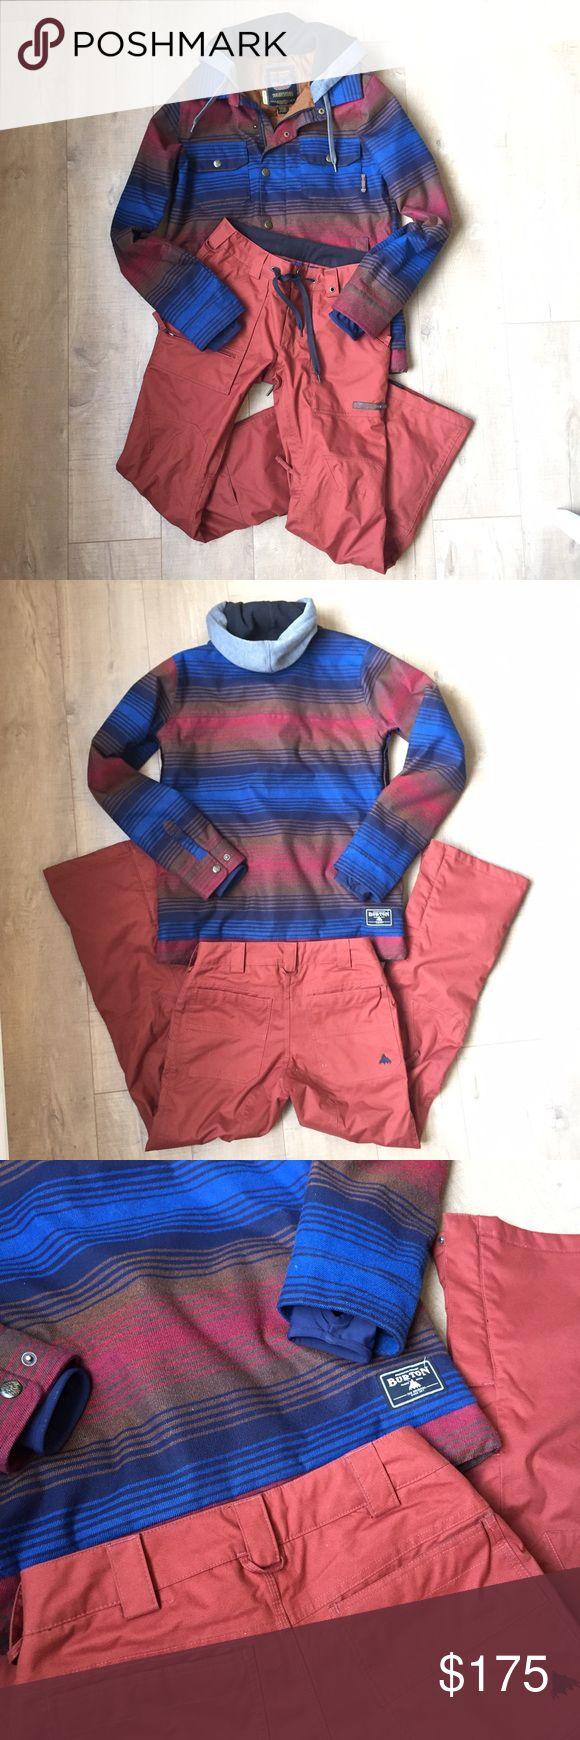 Burton Jacket & Pants Set Burton Dryride ski / snowboard pants & coat set. Excellent condition, only worn twice. Super fun & hard to miss on the slopes! Hooded Coat is XS, pants are S. Burton Jackets & Coats Ski & Snowboard